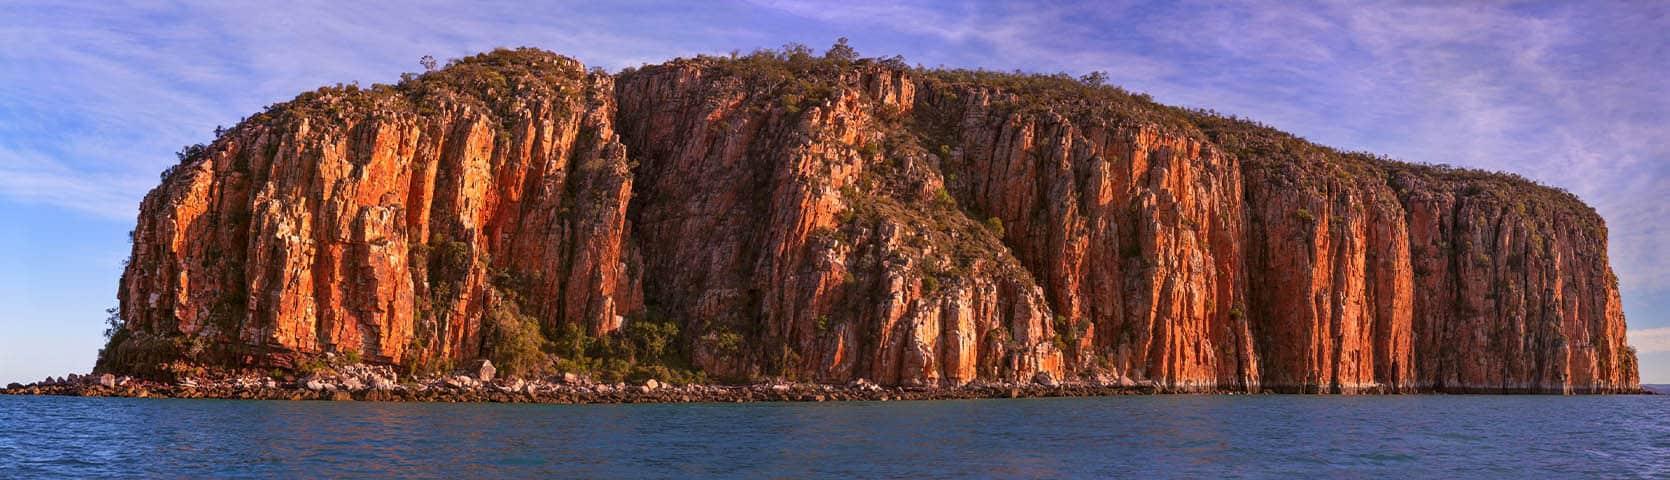 Steep Island The Kimberley